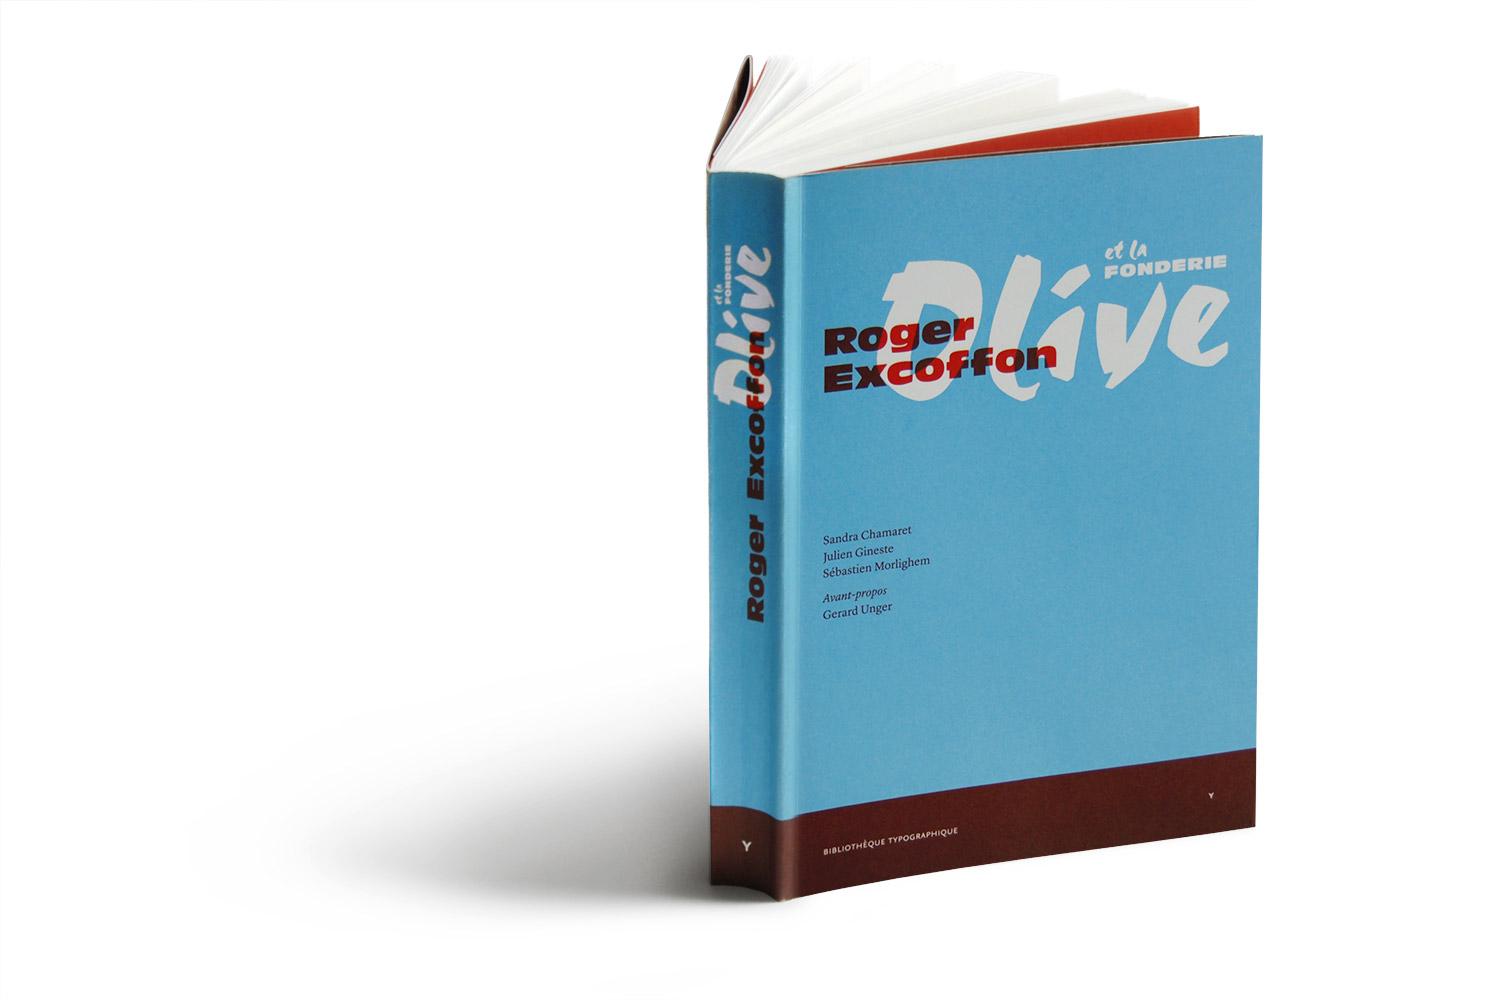 Roger-excofffon-olive.jpg